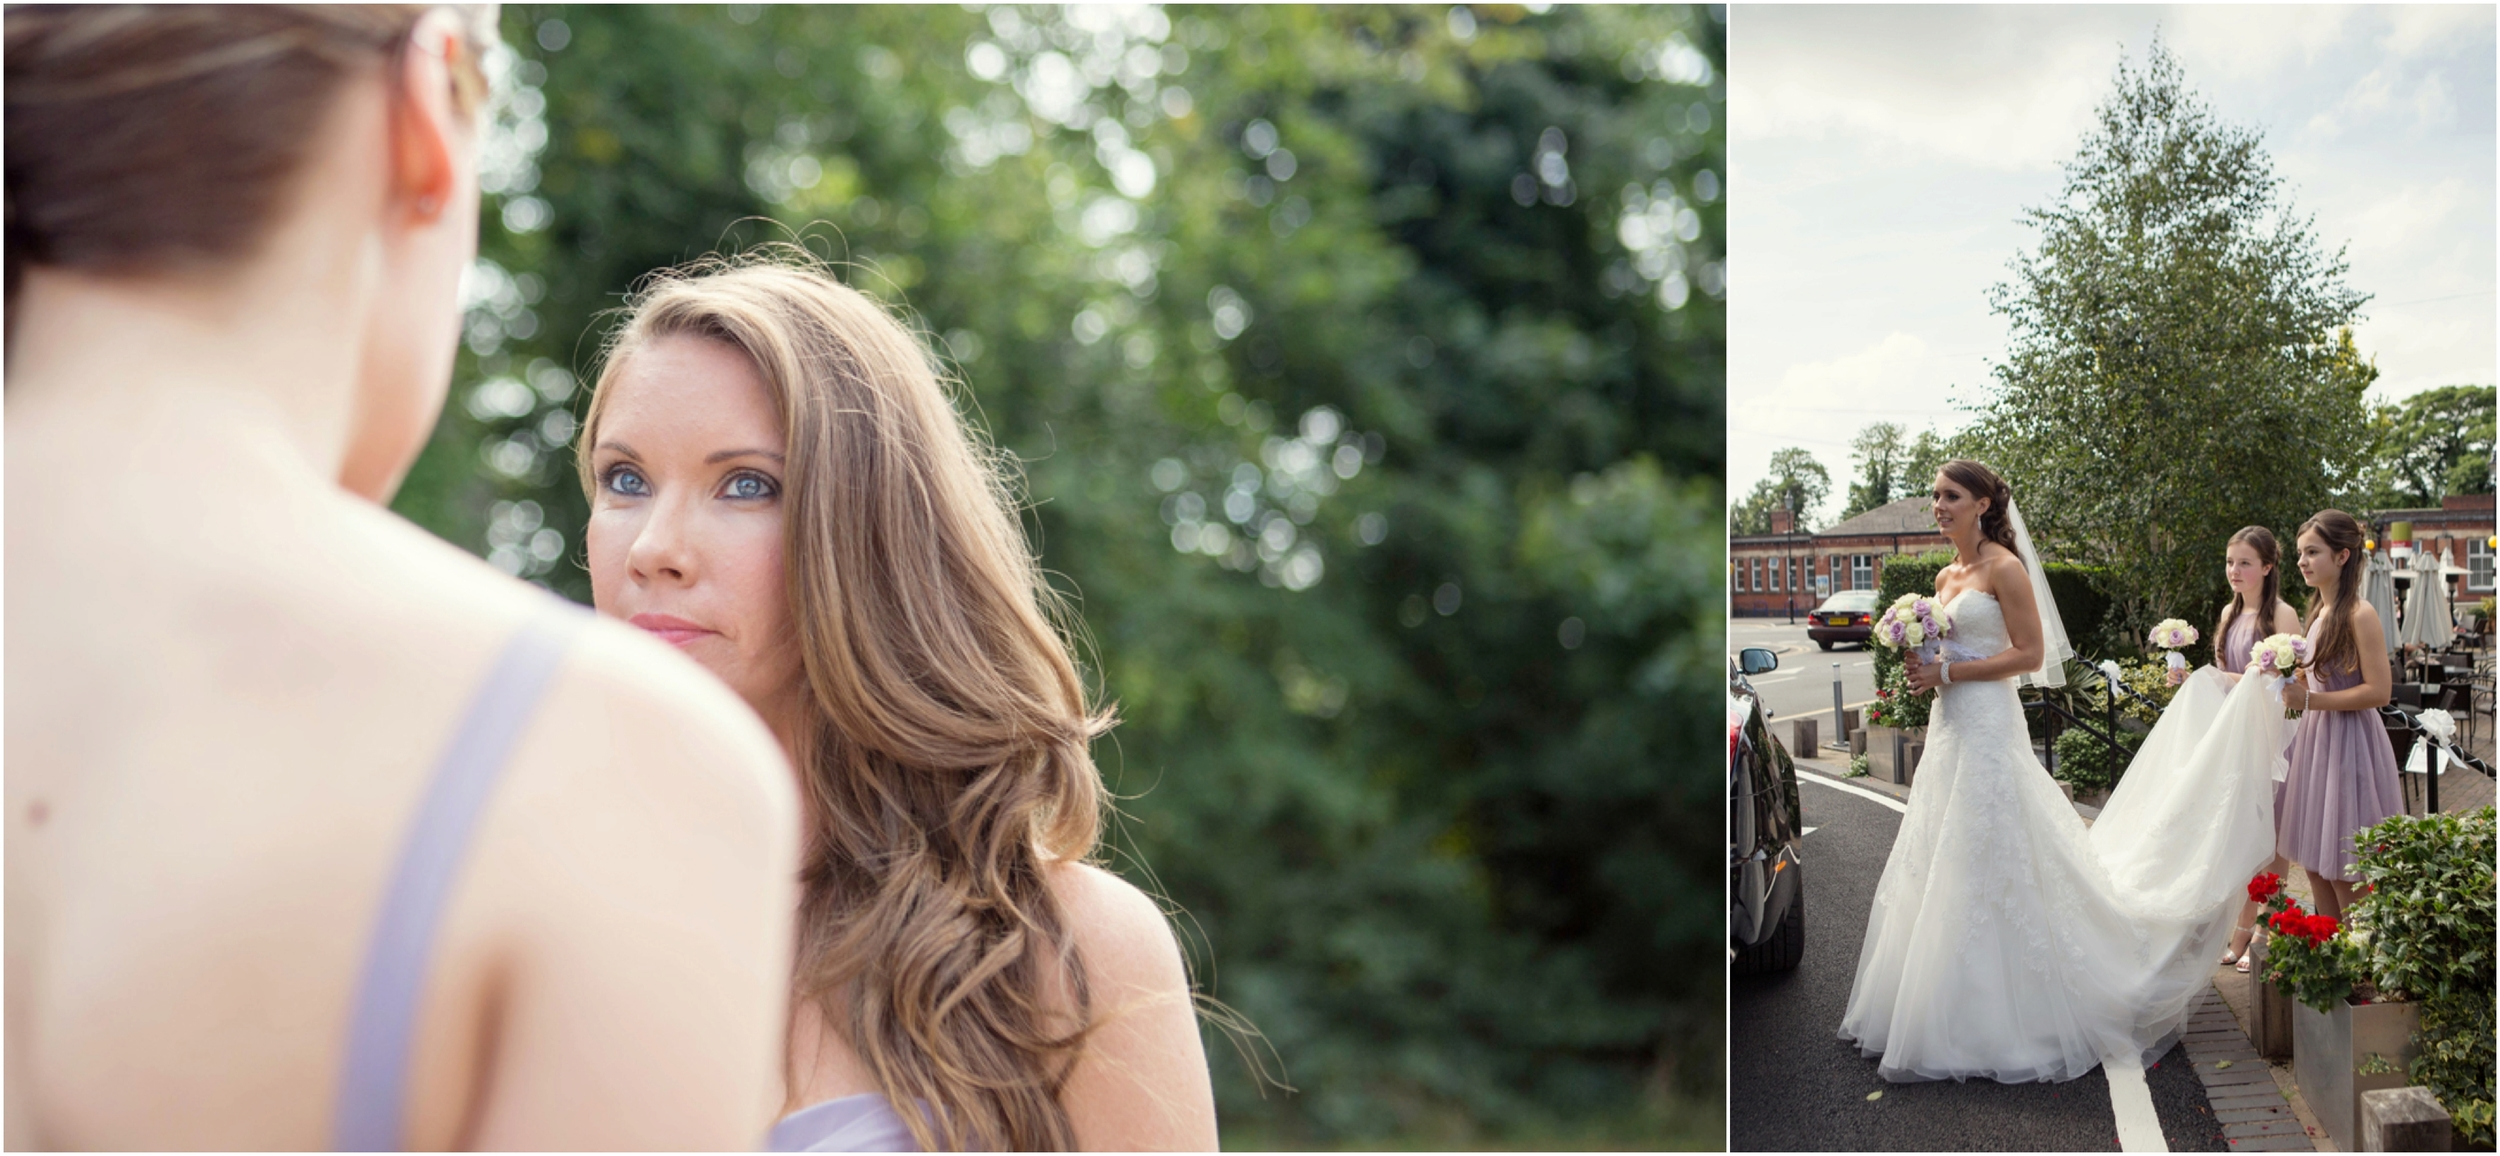 Sophie Evans Photography, Warwickshire Wedding Photography, Welcombe Hotel  (19).jpg